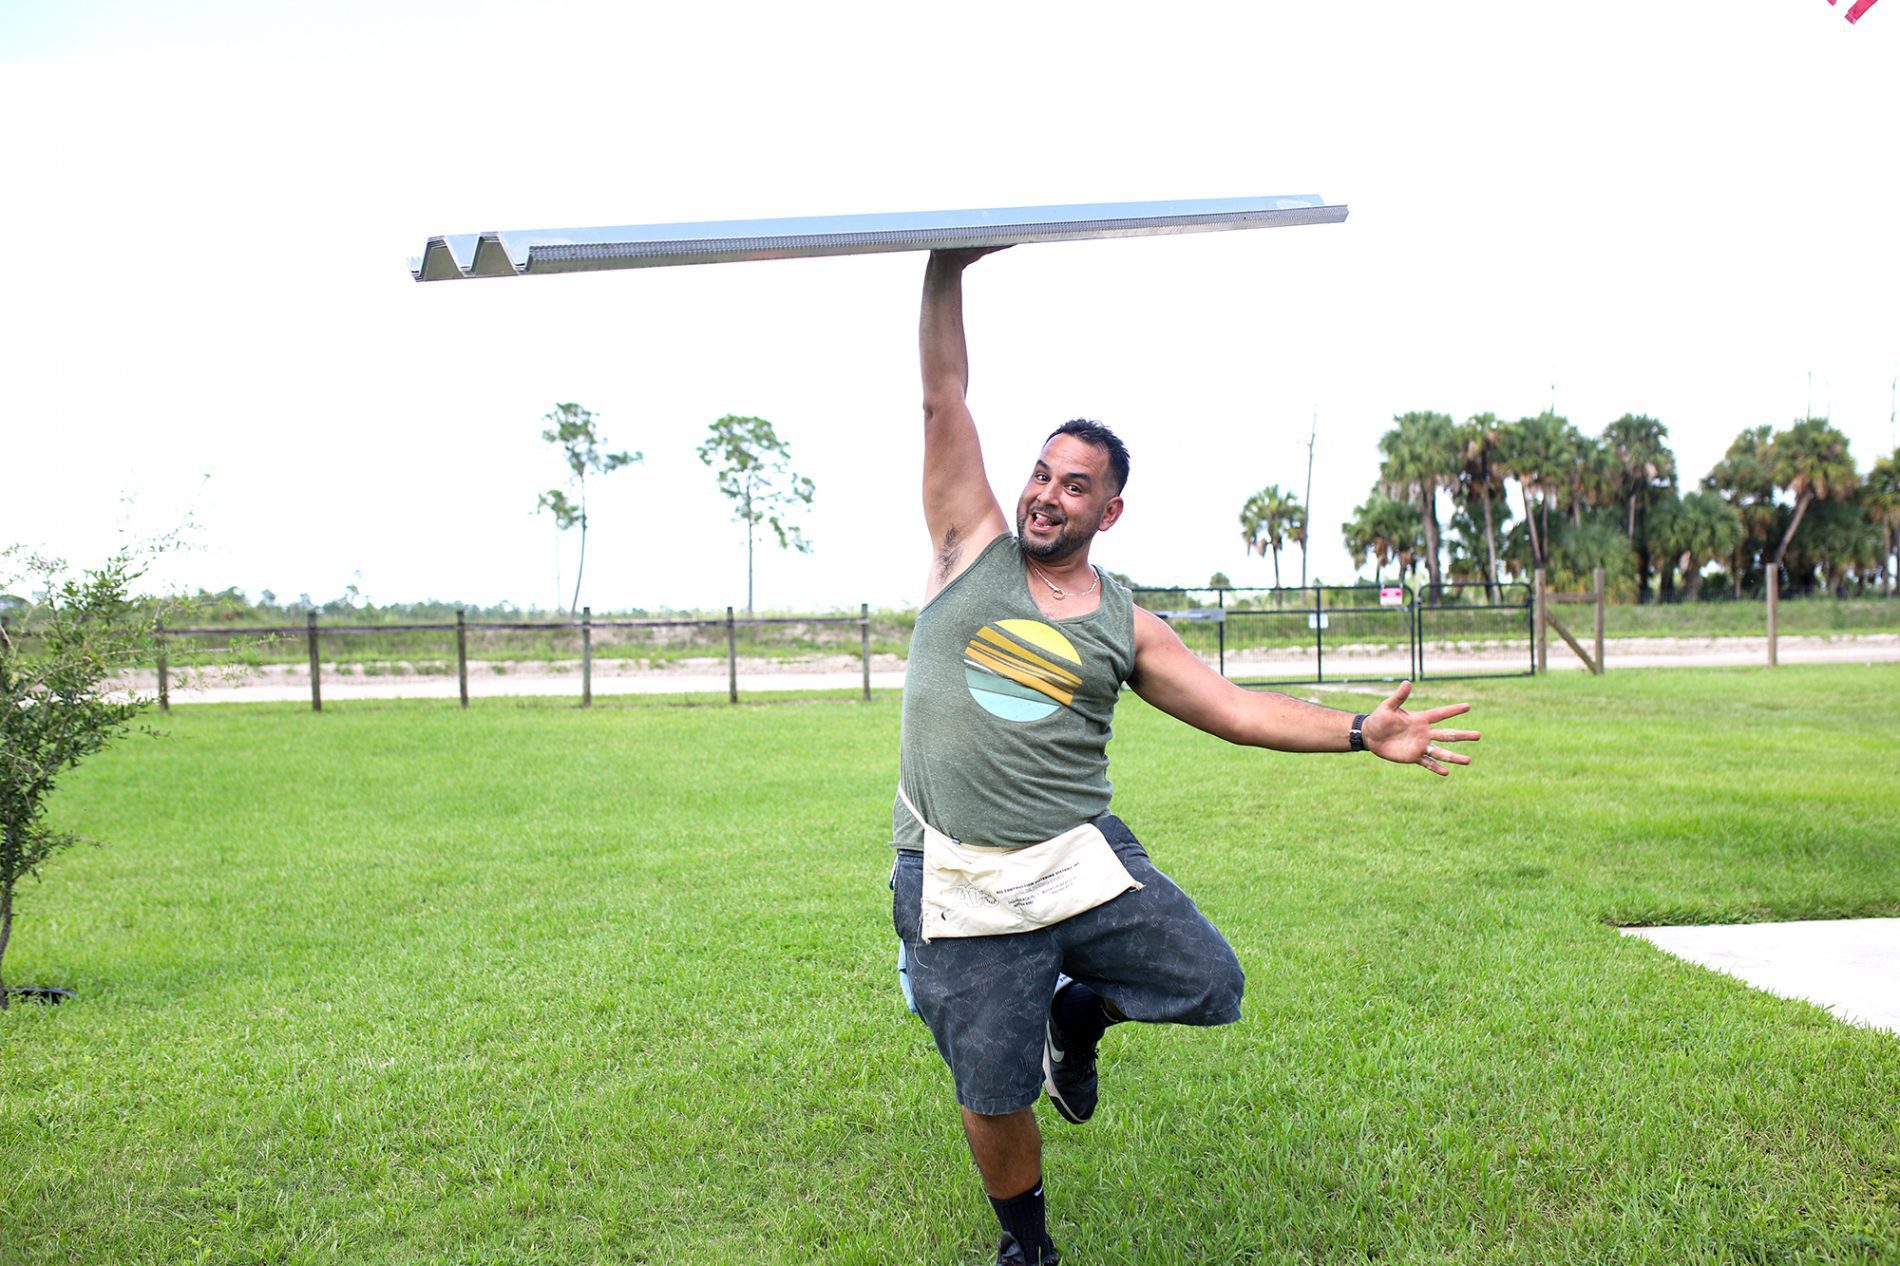 super dad balancing a hurricane shutter on his hand